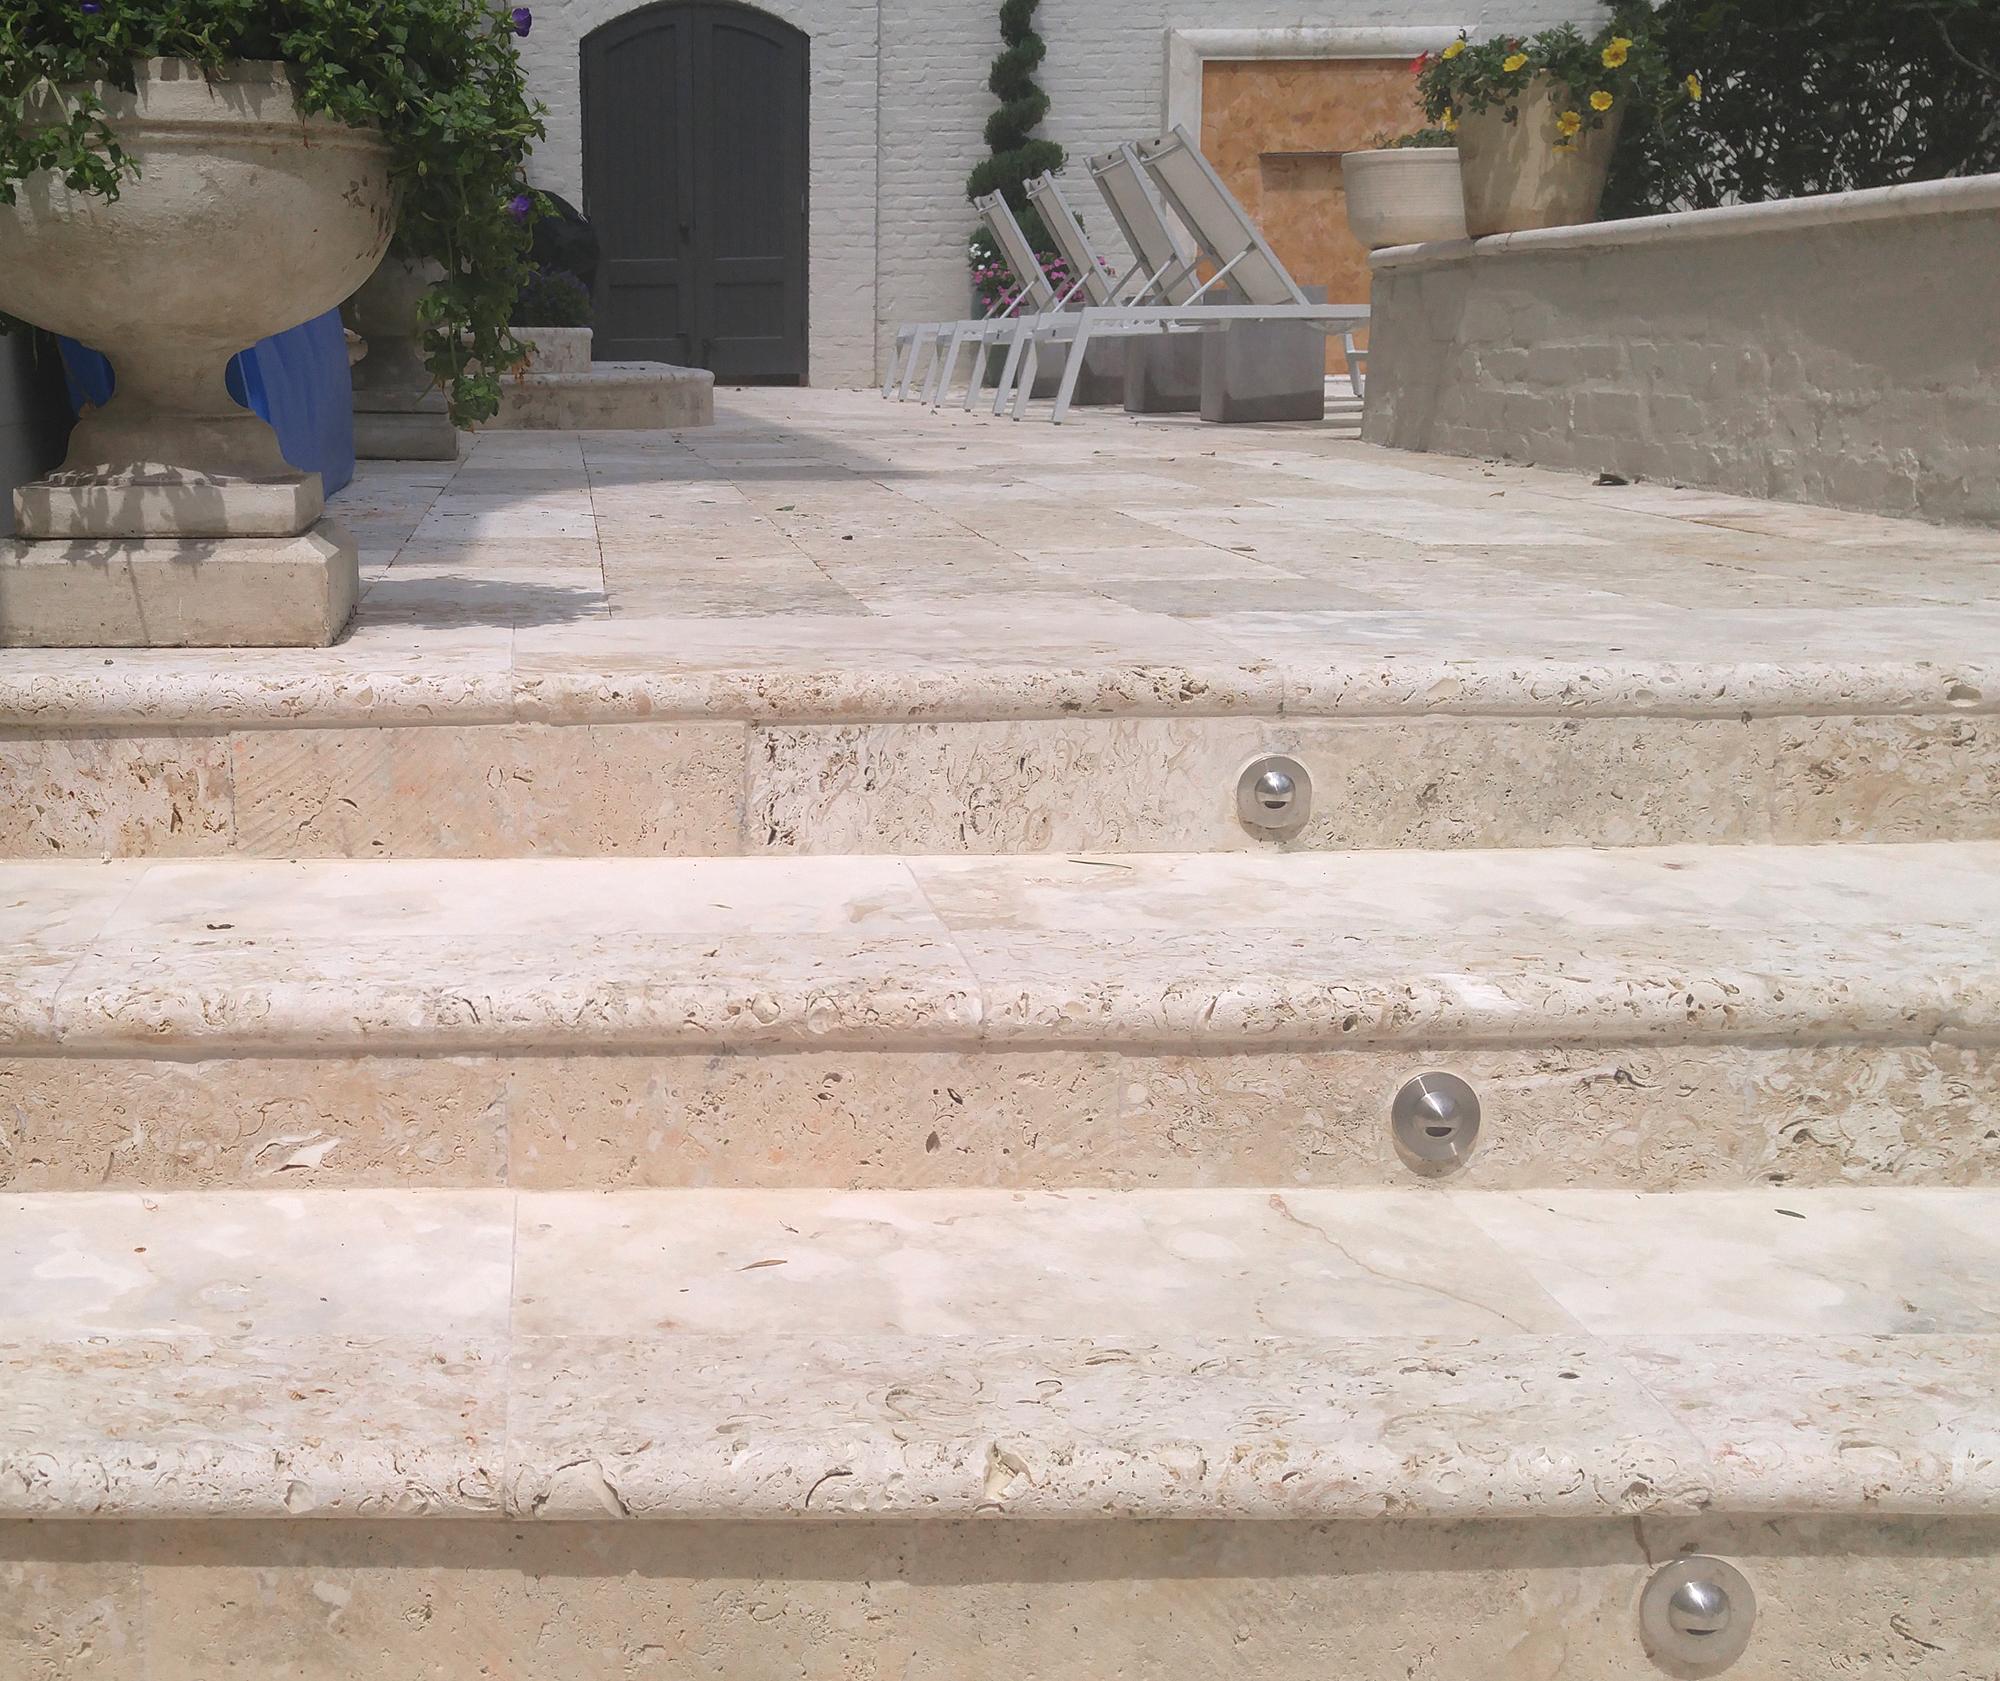 Ostra_steps_Beven_2000x1681_0520161057.jpg